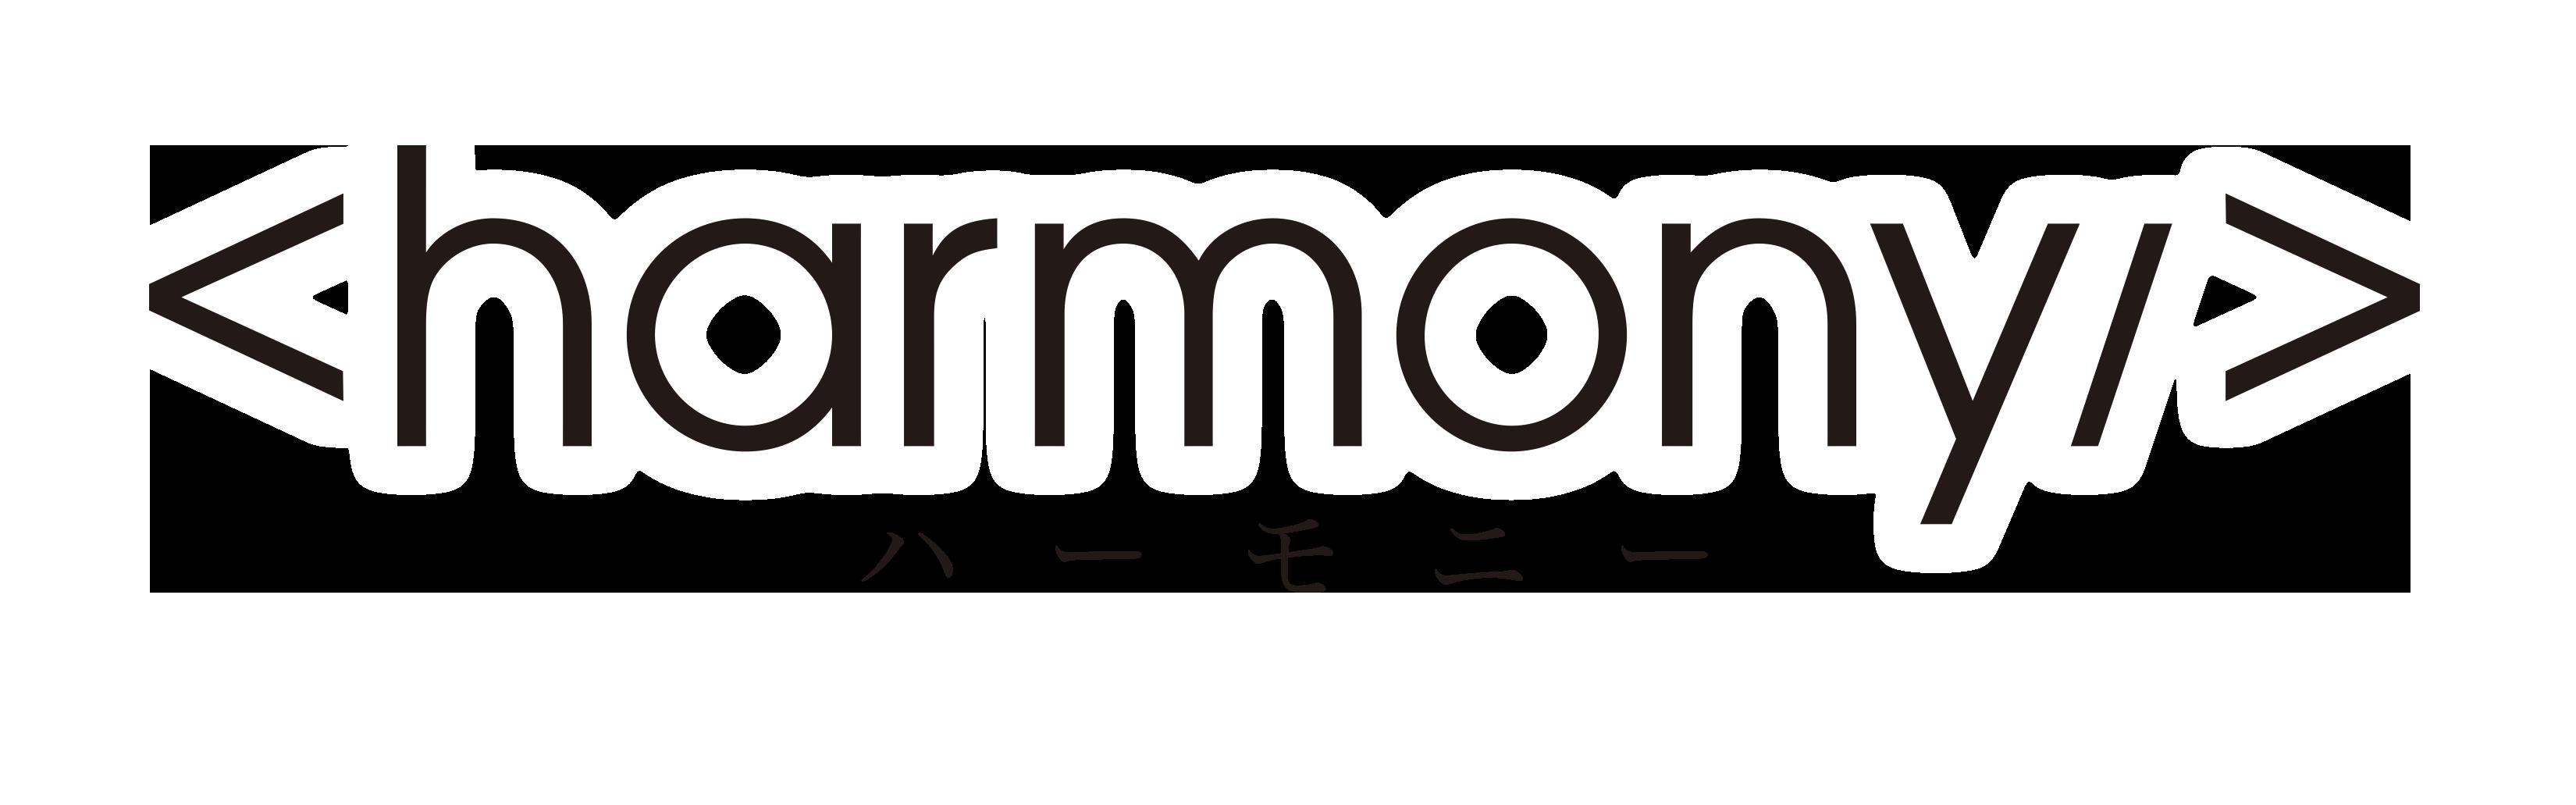 sarmony